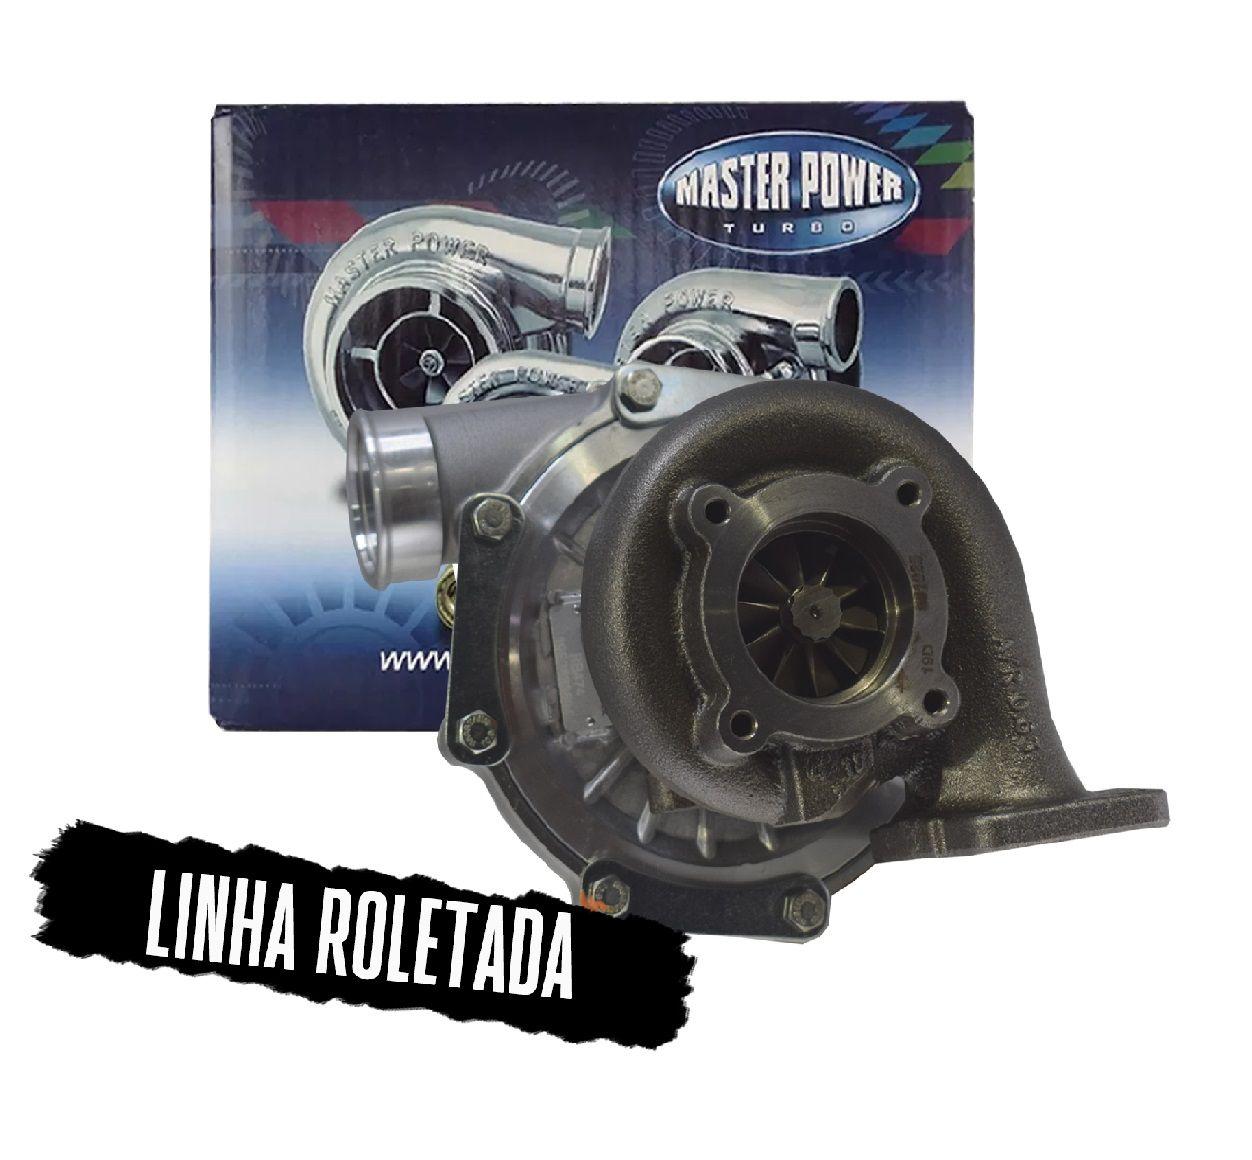 TURBINA ROLETADA / BEARING MASTER POWER - RB 474 .84